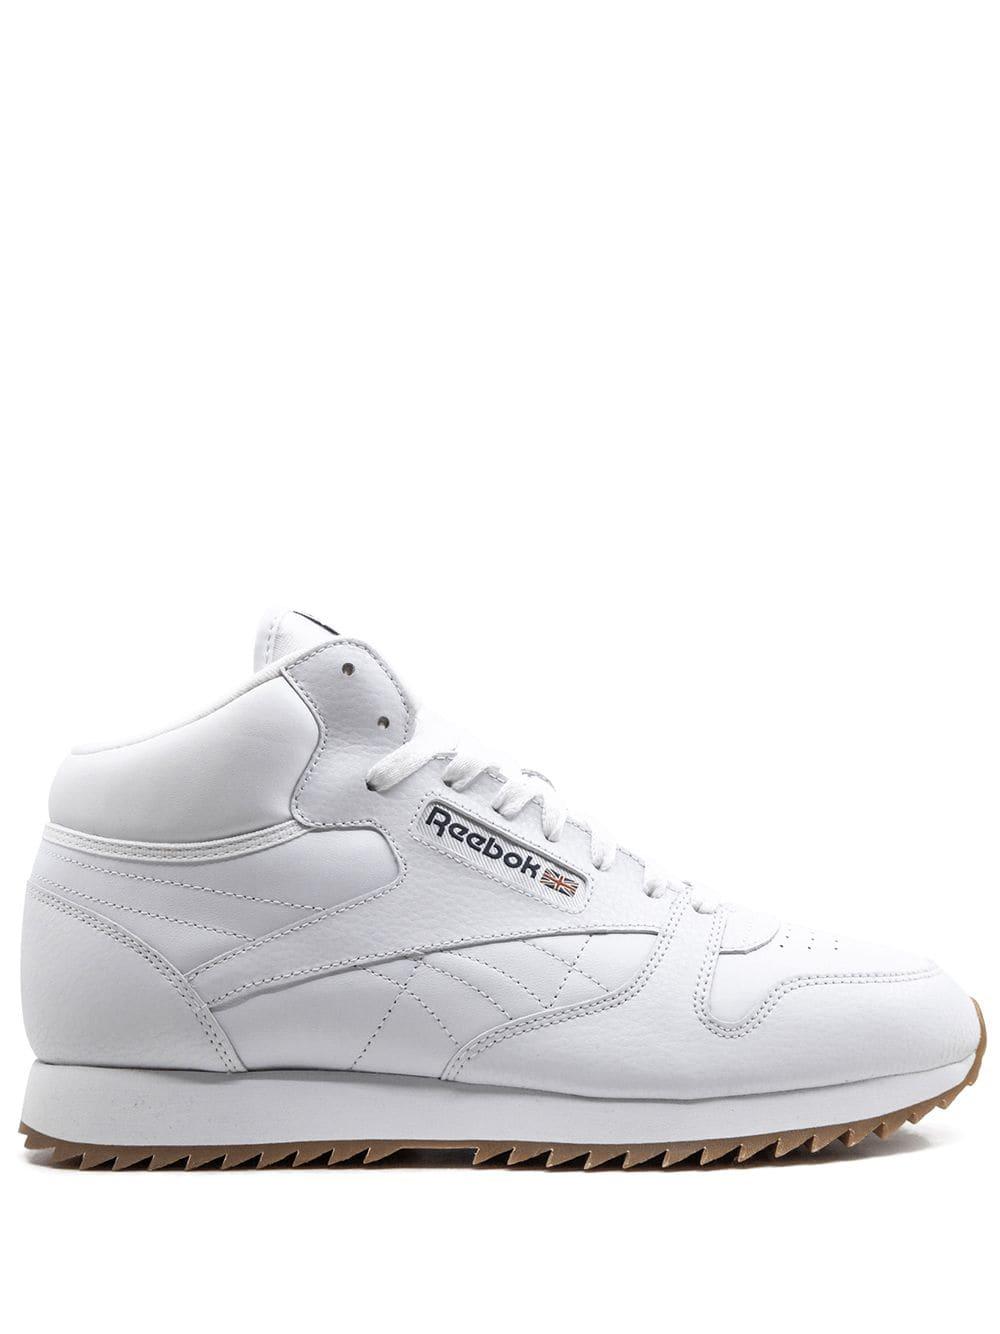 laberinto pozo Desarmado  Reebok Cl Lthr Mid Ripple Gum Sneakers In White | ModeSens | Sneakers men  fashion, Sneakers white, Sneakers